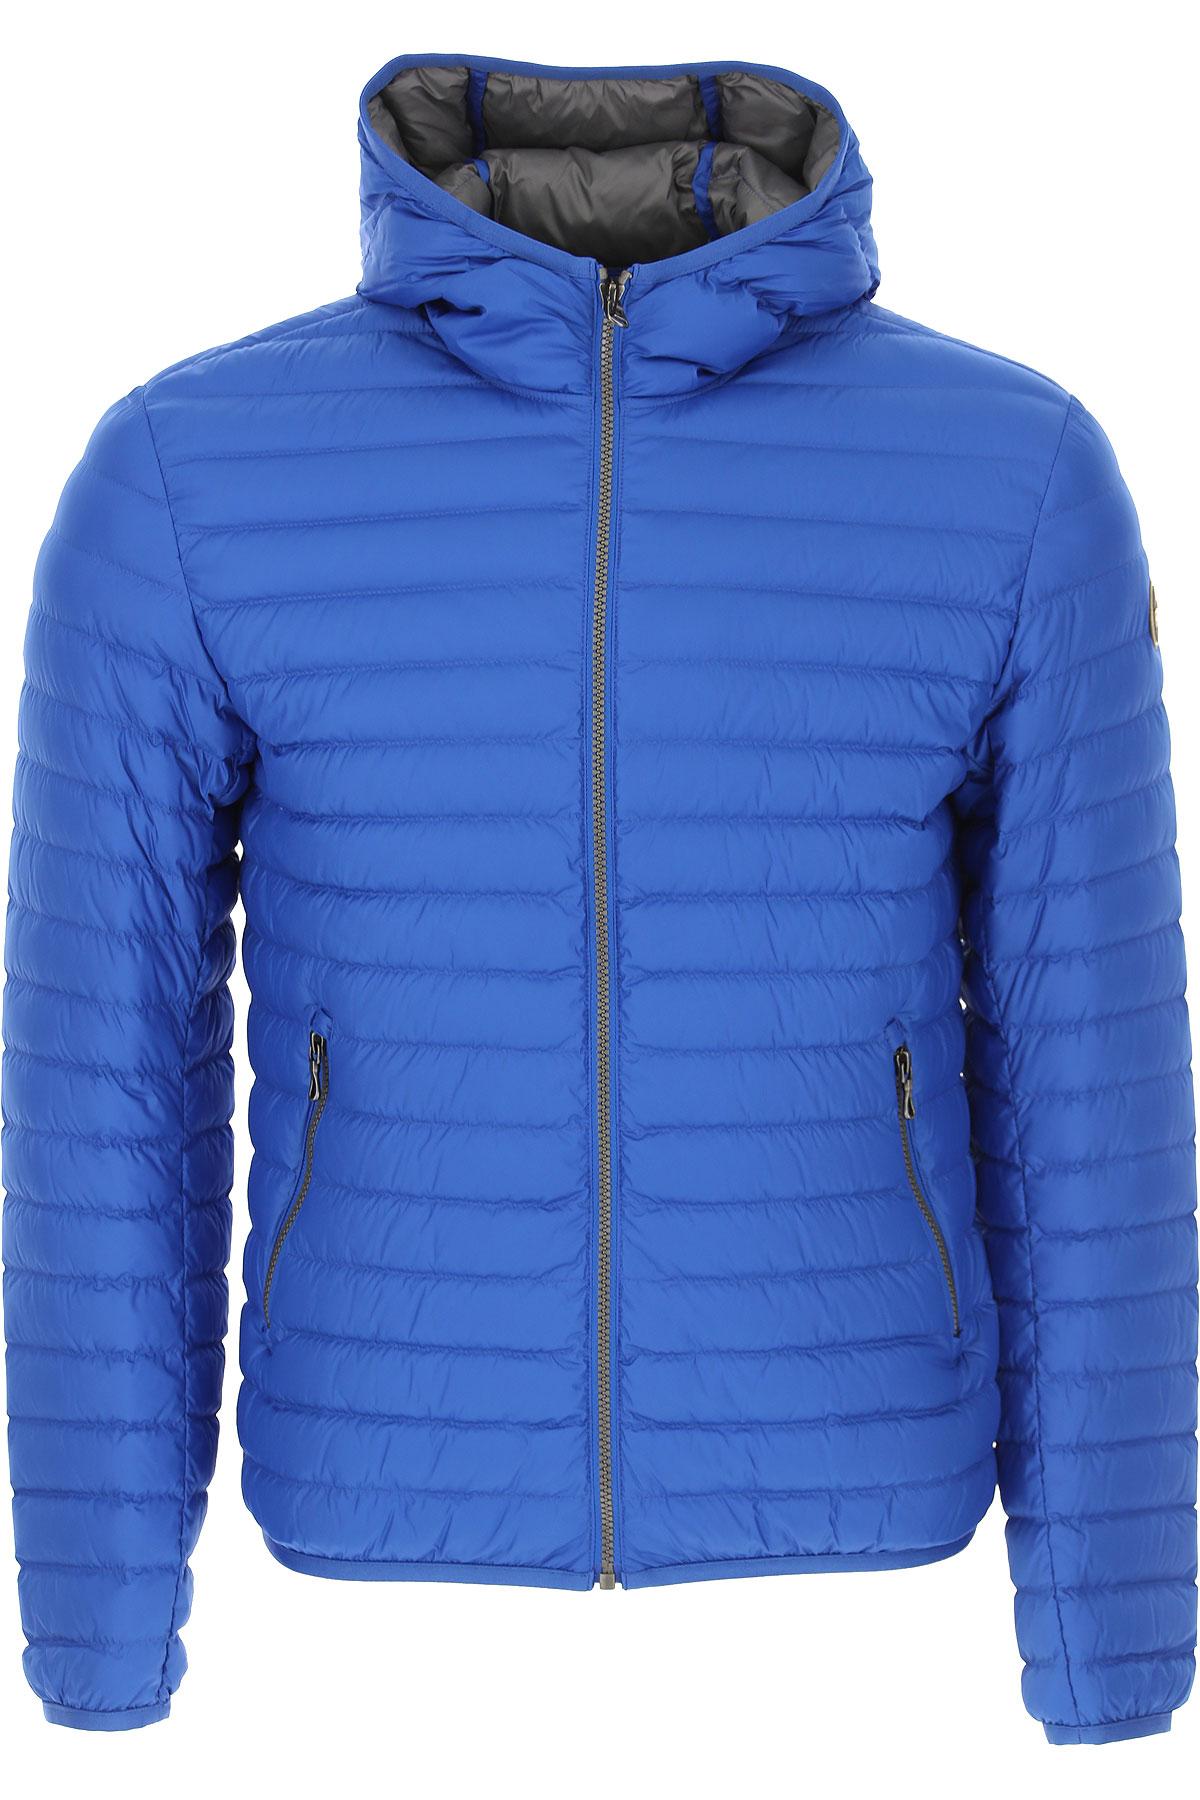 Colmar Down Jacket for Men, Puffer Ski Jacket On Sale, Royal Blue, polyester, 2019, M S XL XXL